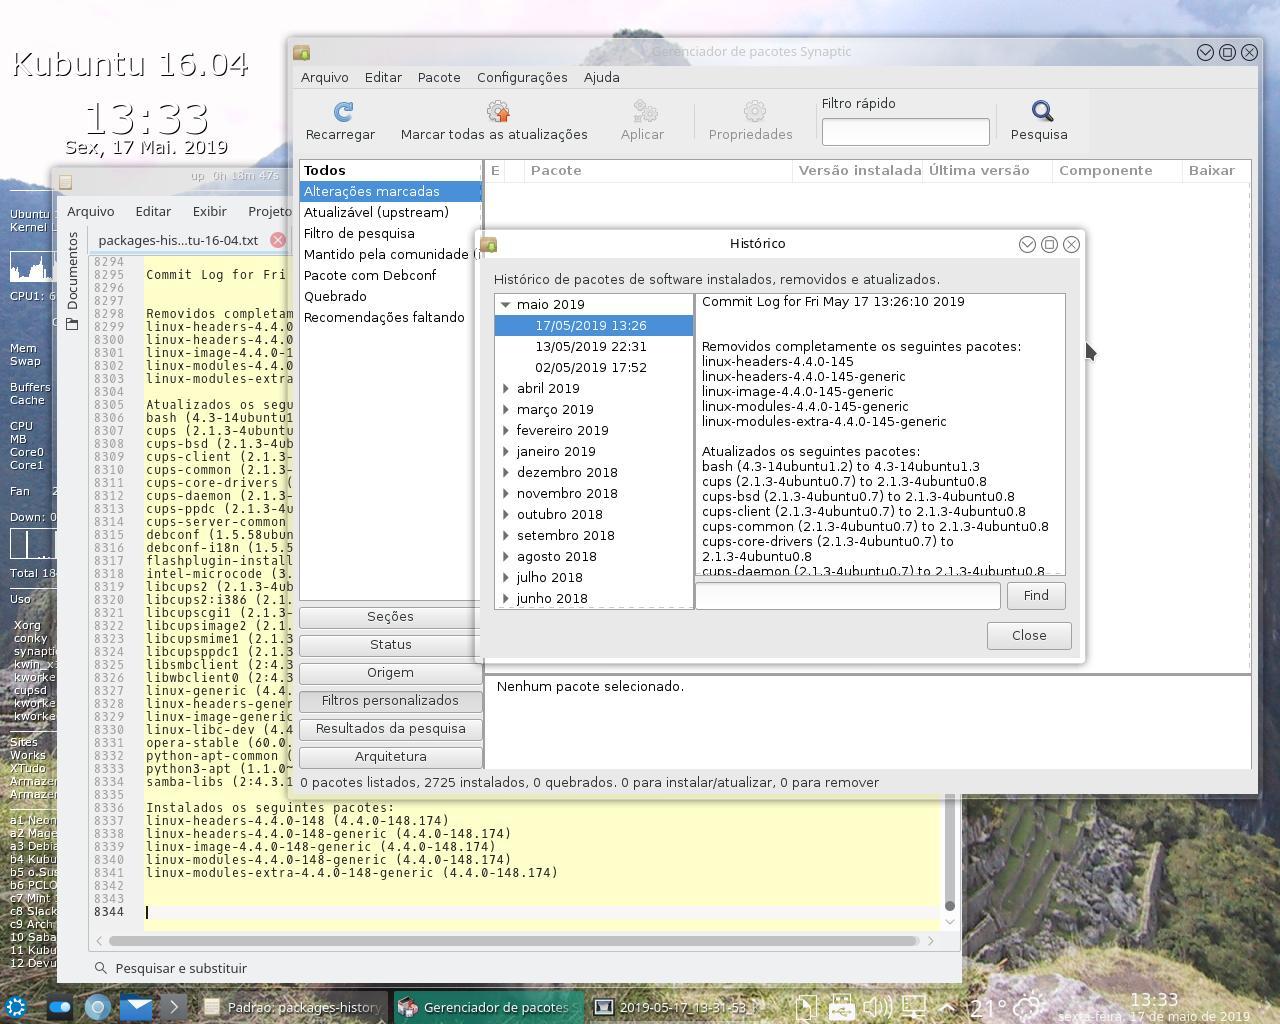 Byteria: Kubuntu 16 04 LTS Xenial - histórico de pacotes